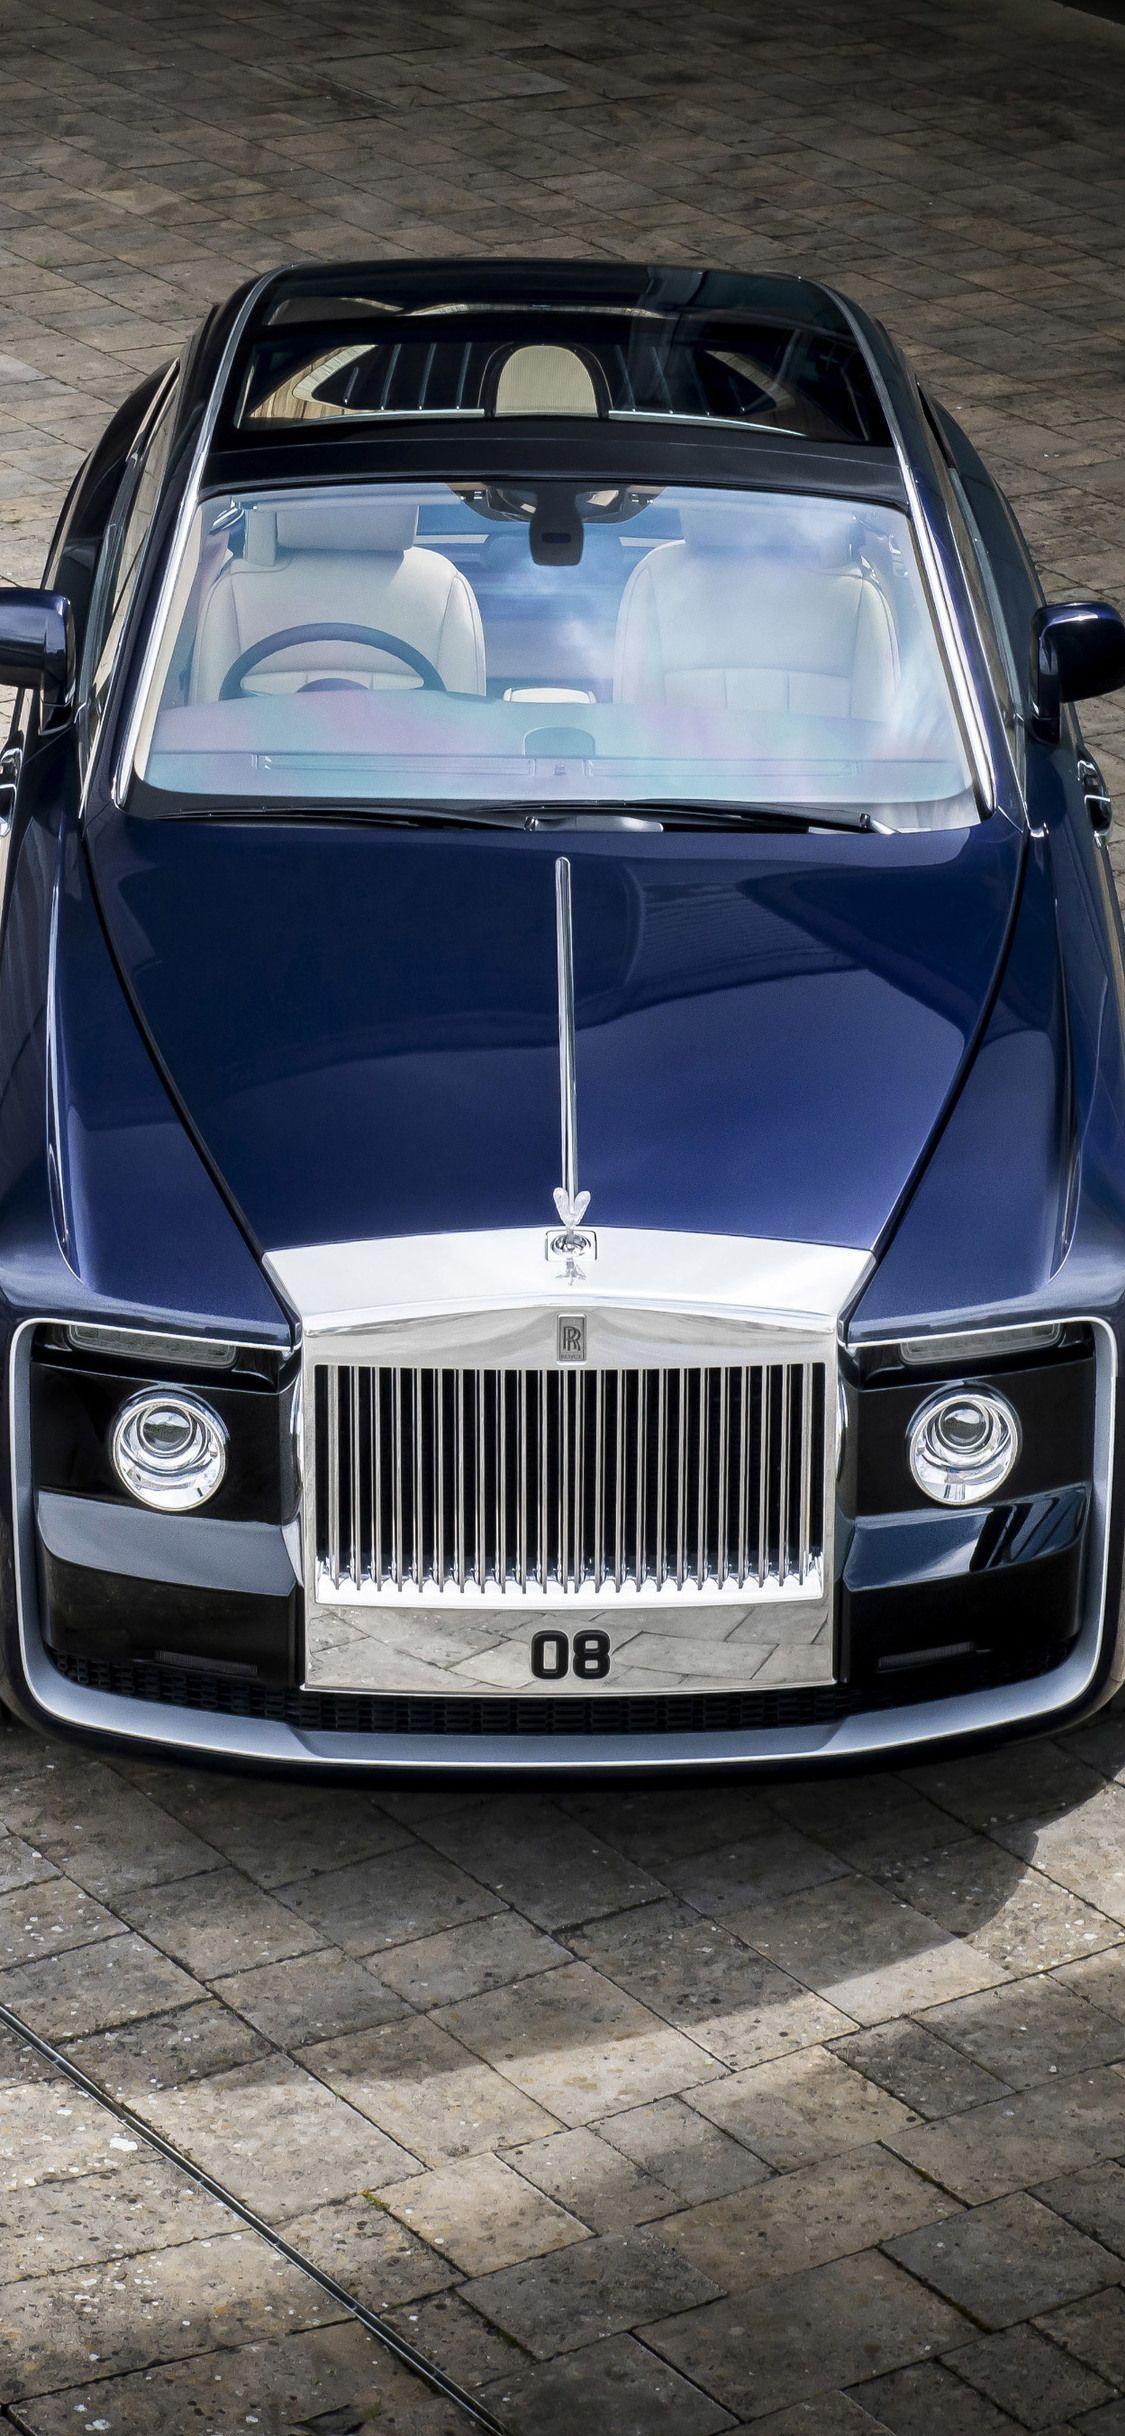 Rolls Royce Iphone Wallpapers Top Free Rolls Royce Iphone